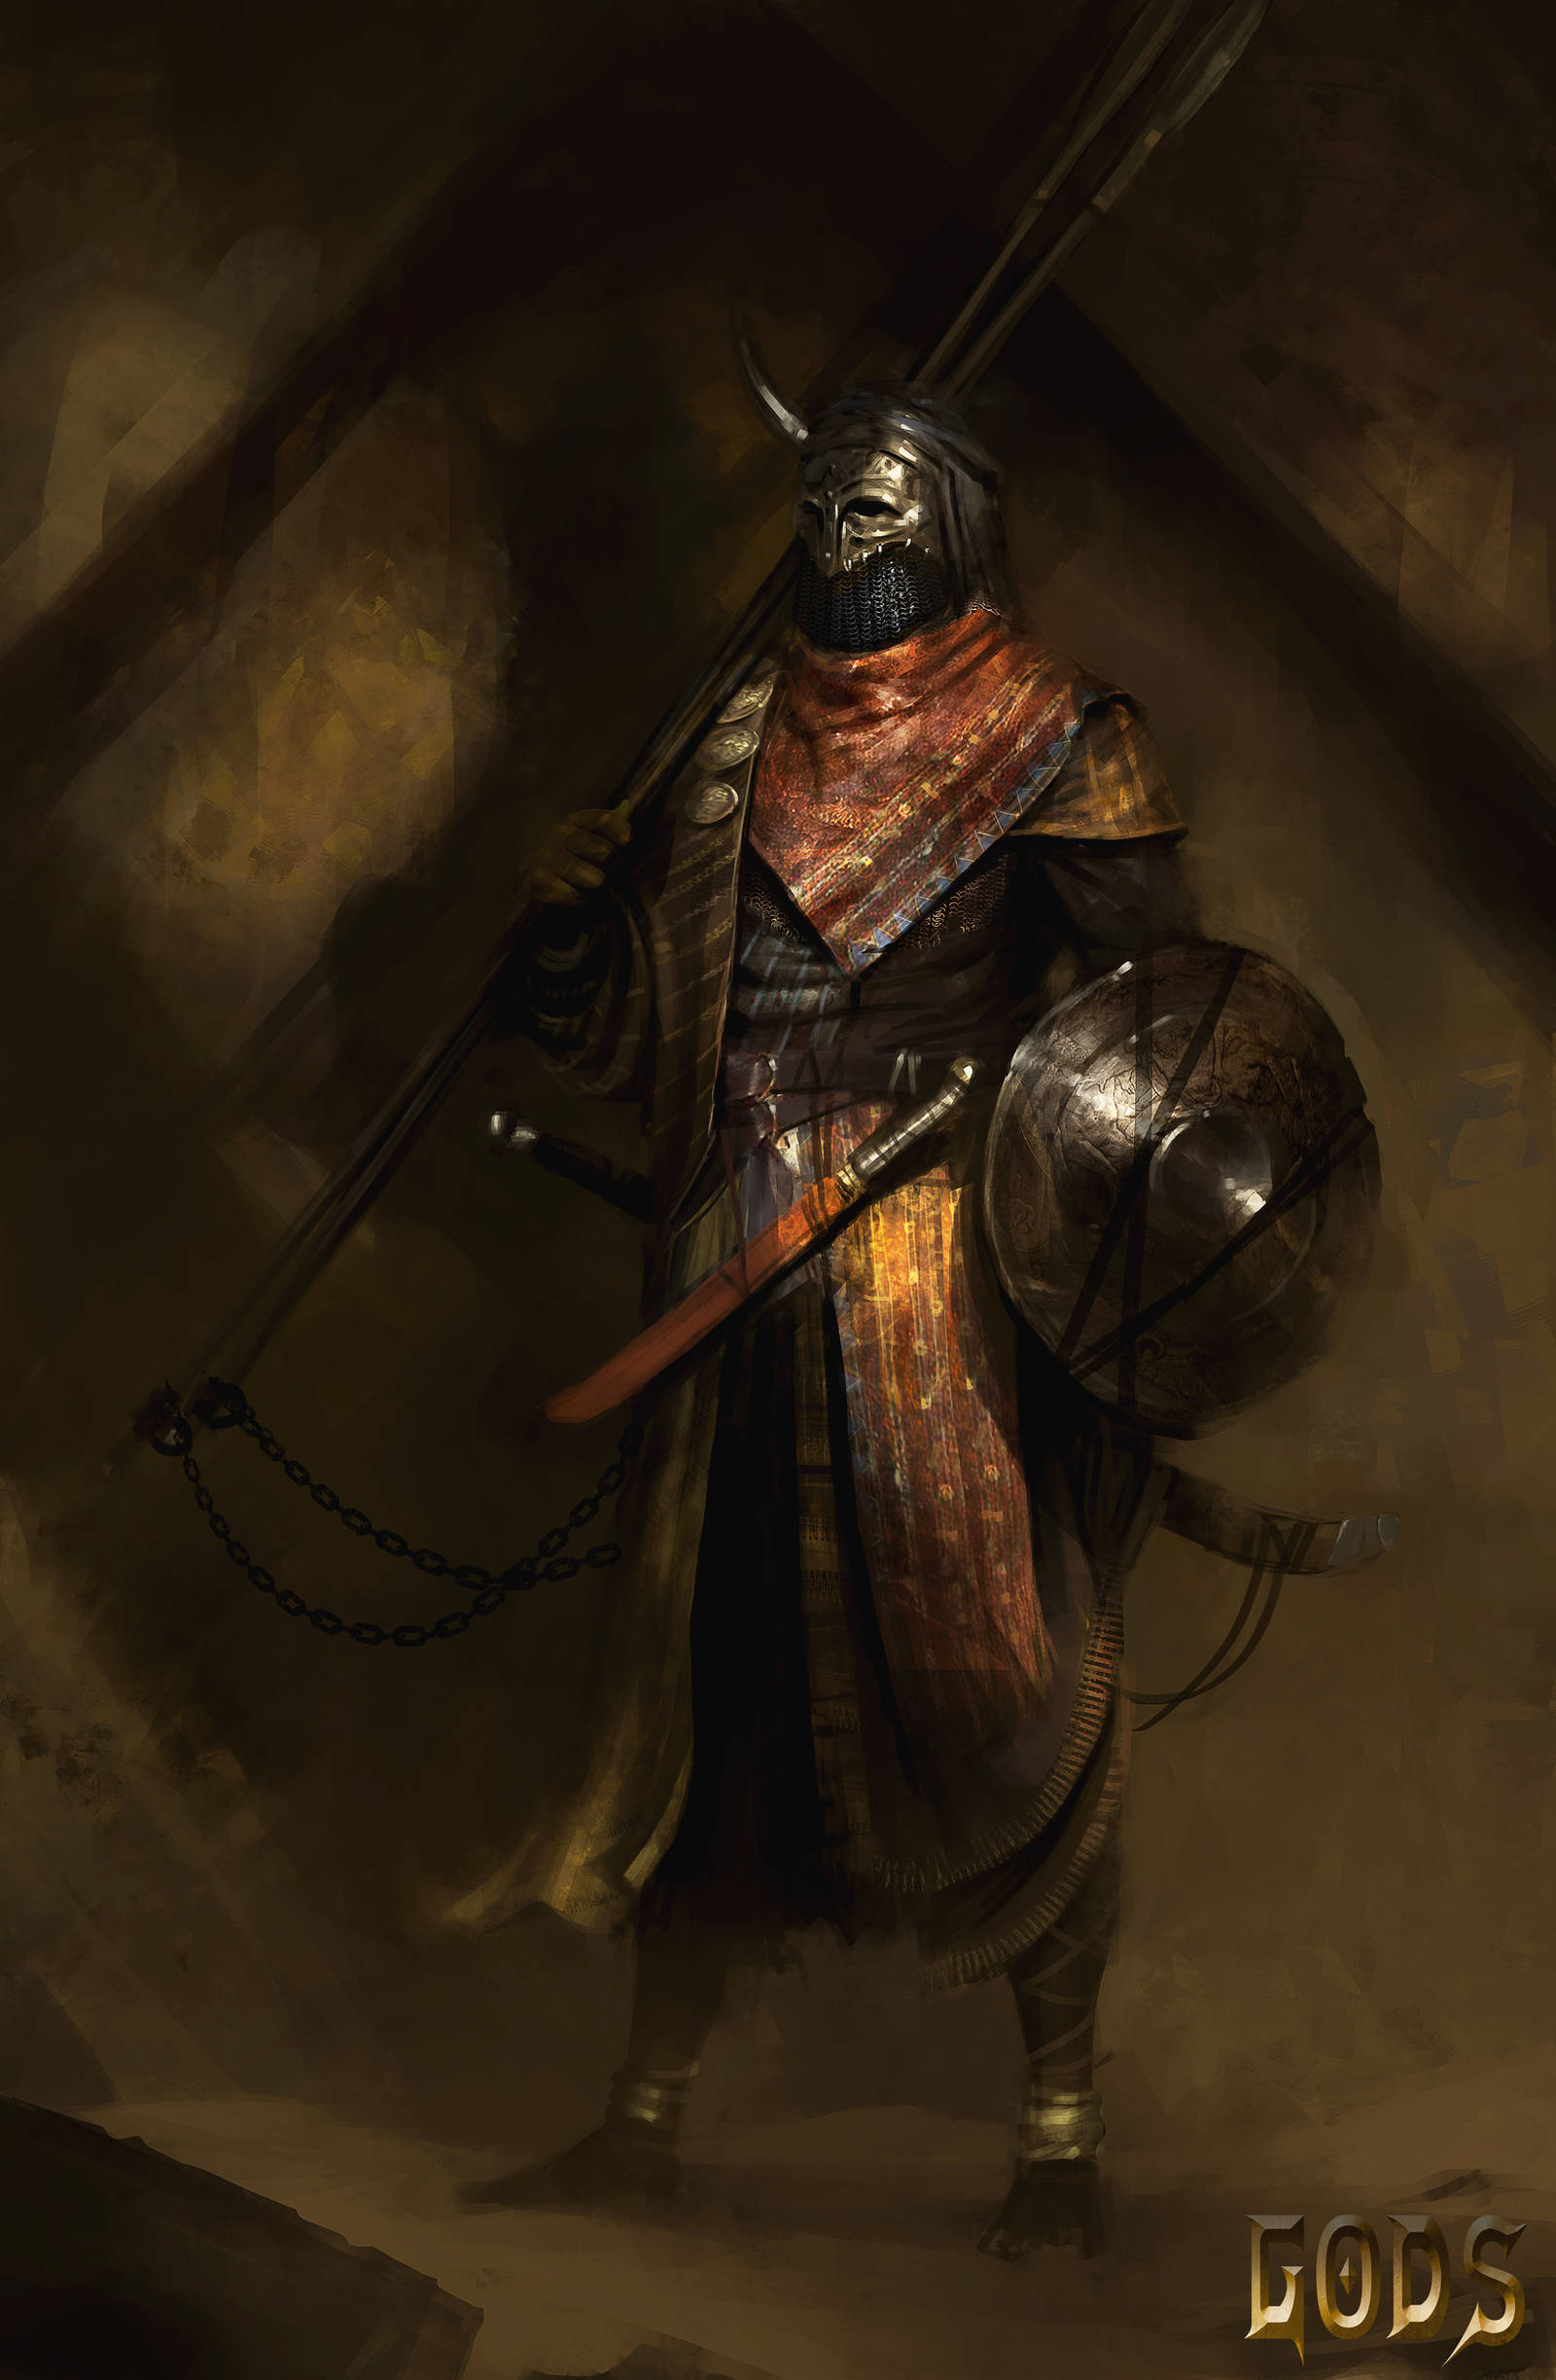 Ool warrior by Asahisuperdry